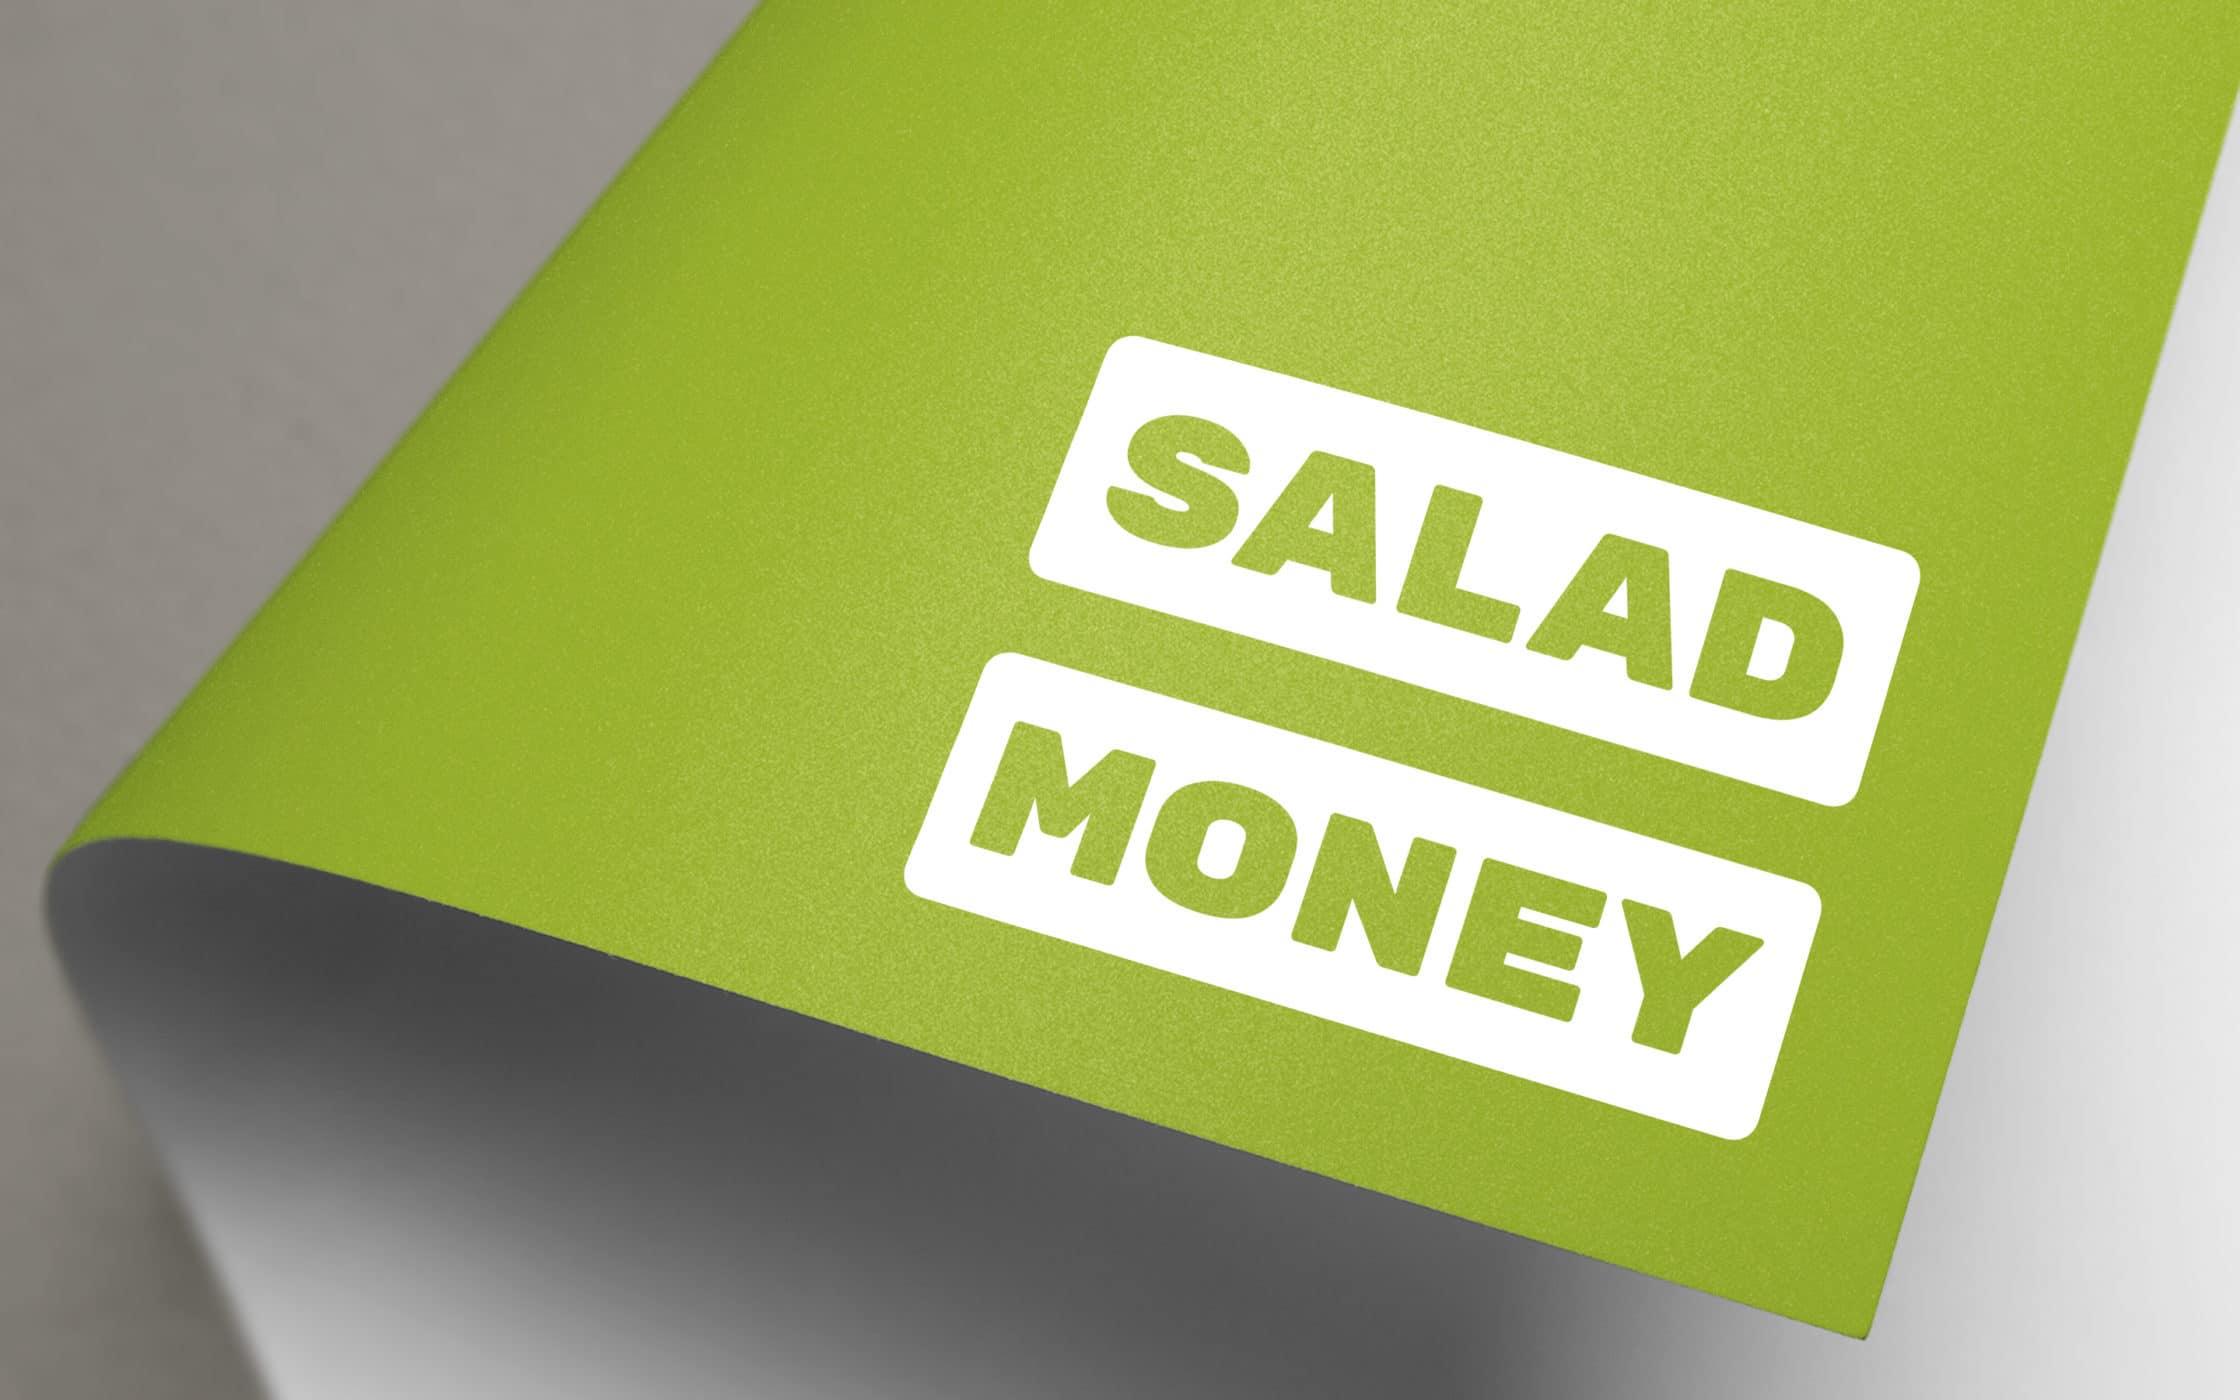 Salad-Money-1-scaled